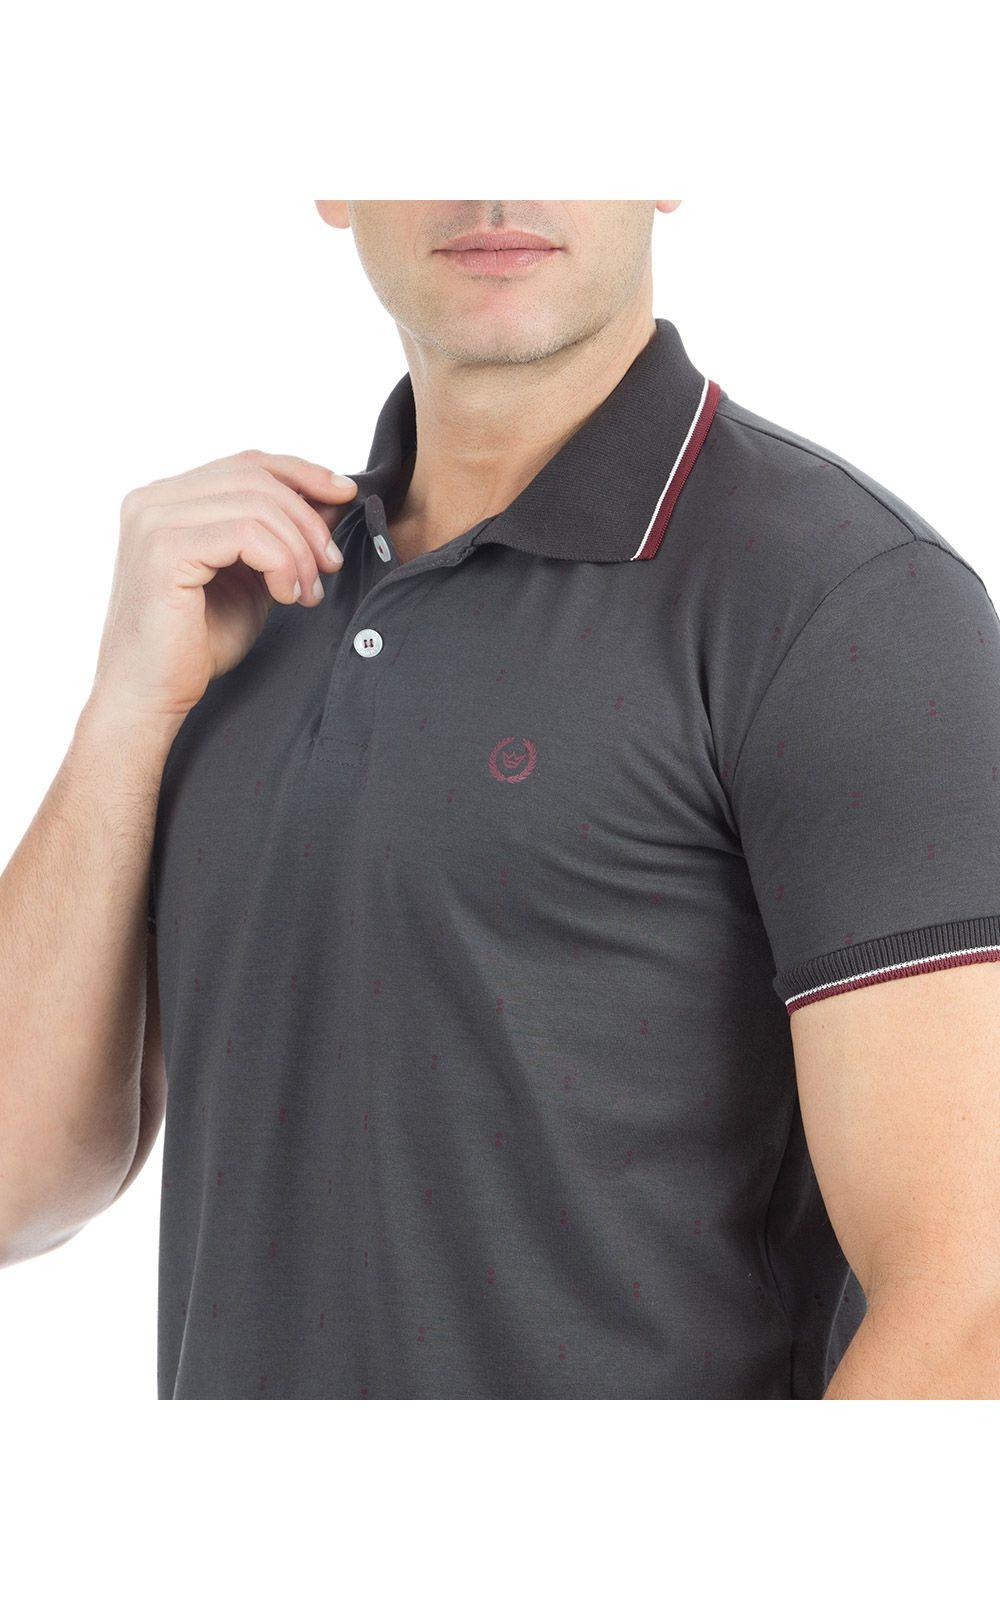 Foto 3 - Camisa Polo Masculina Cinza Escuro Estampada